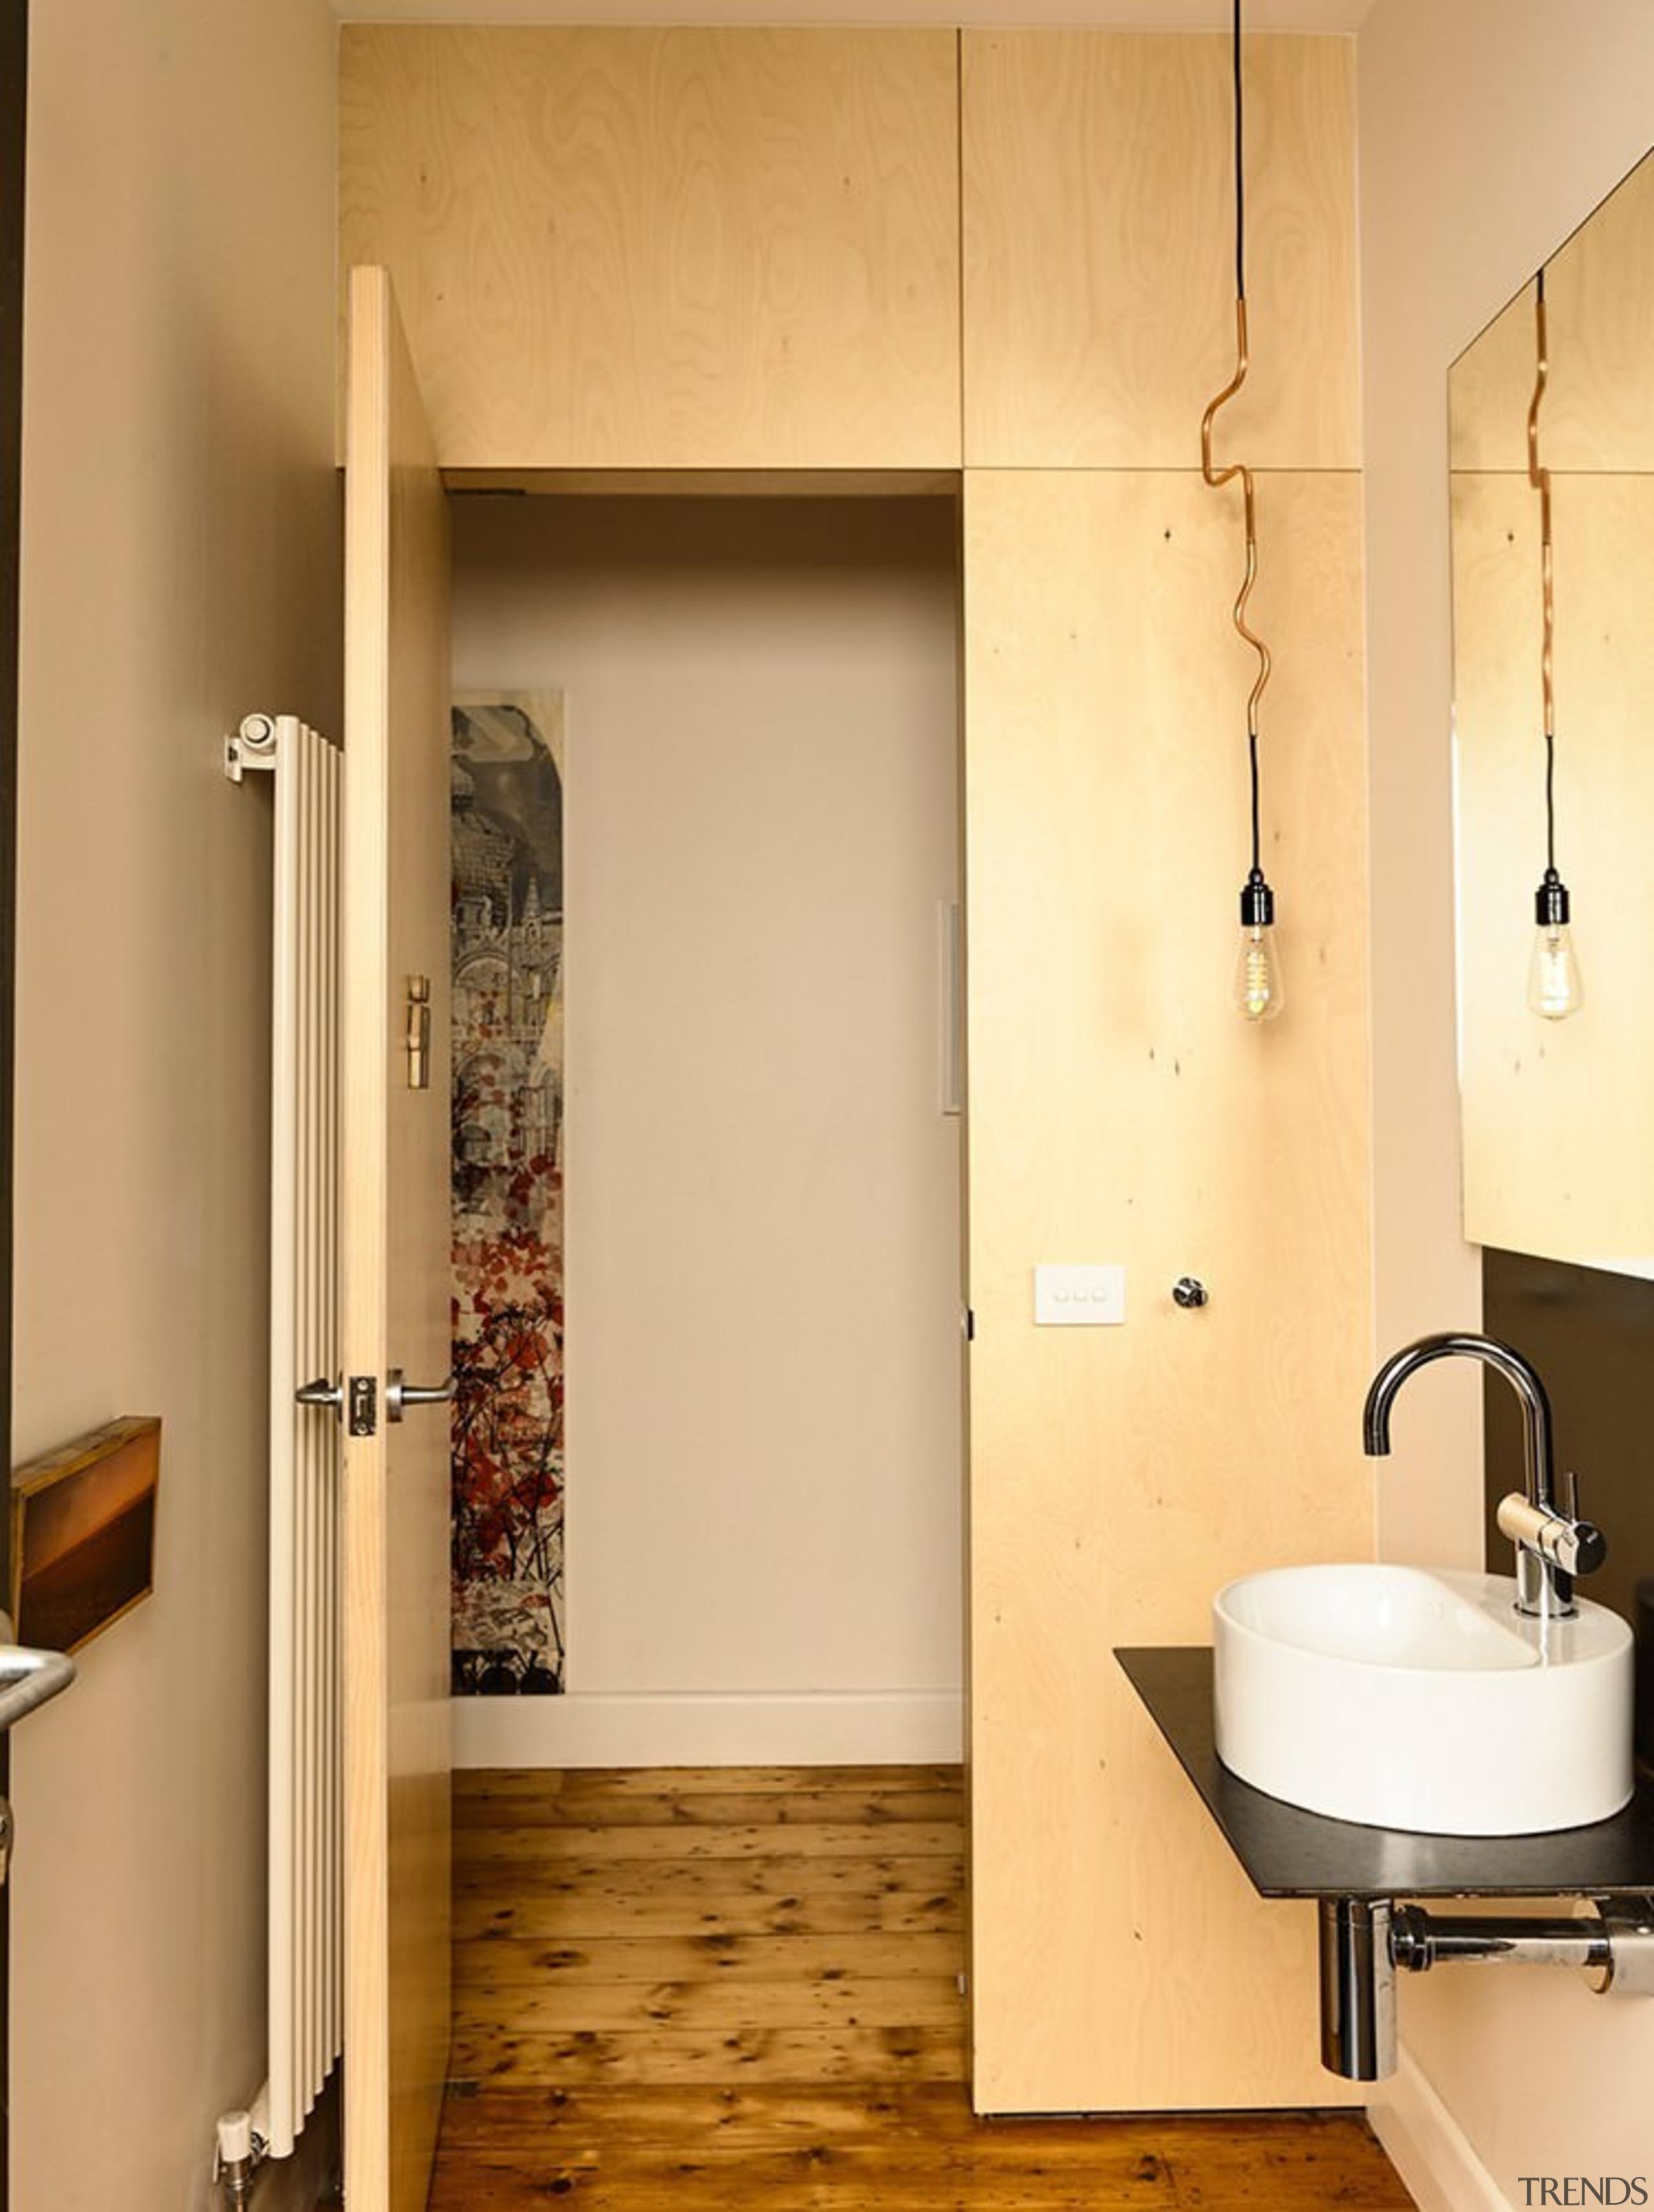 A floating sink makes the bathroom feel larger bathroom, bathroom accessory, bathroom cabinet, ceiling, floor, flooring, interior design, plumbing fixture, room, wall, wood, orange